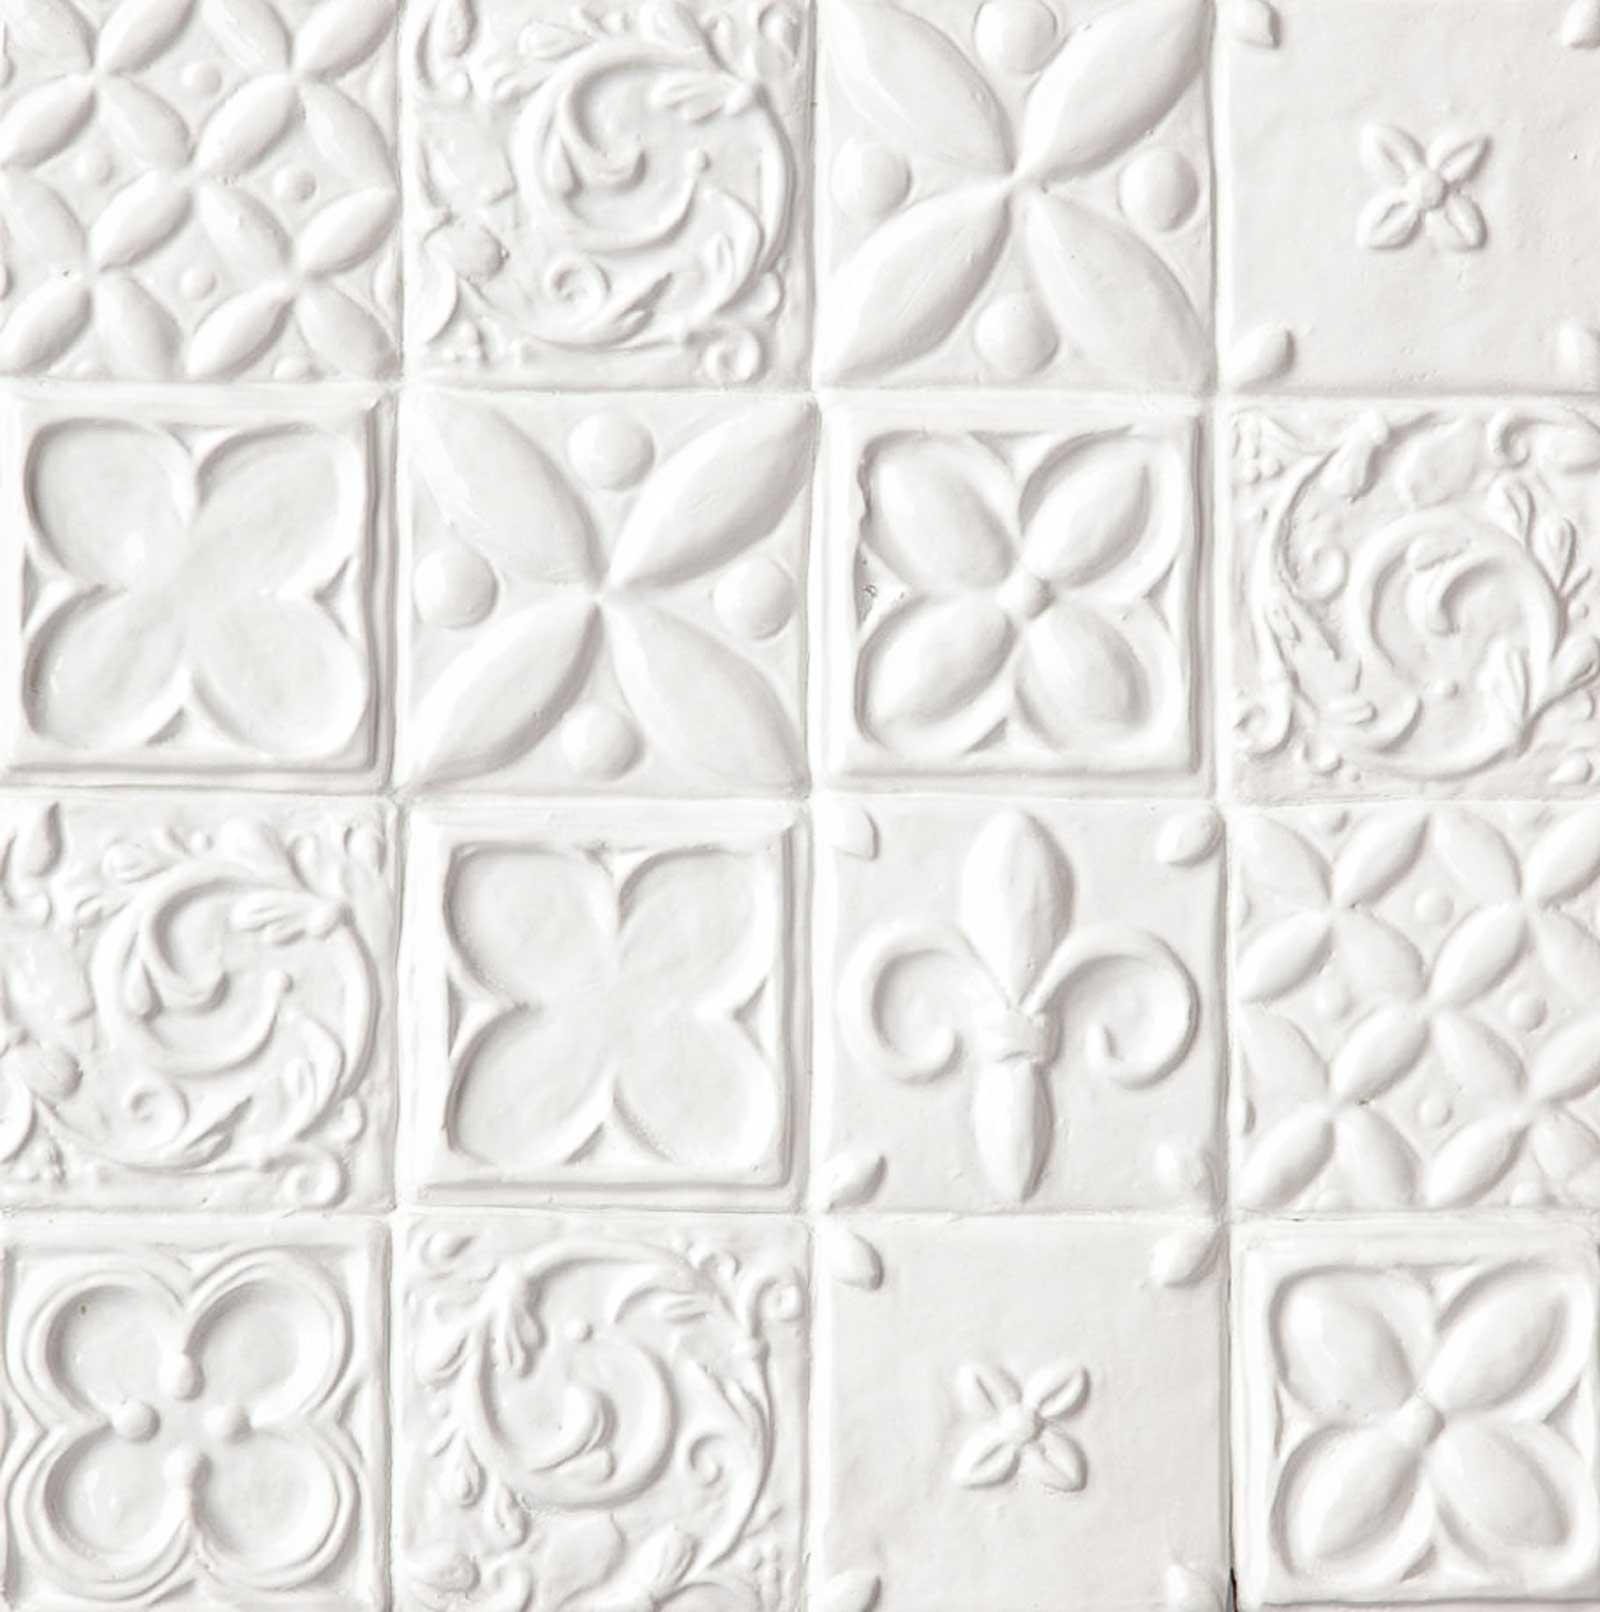 Handmade decorative tile